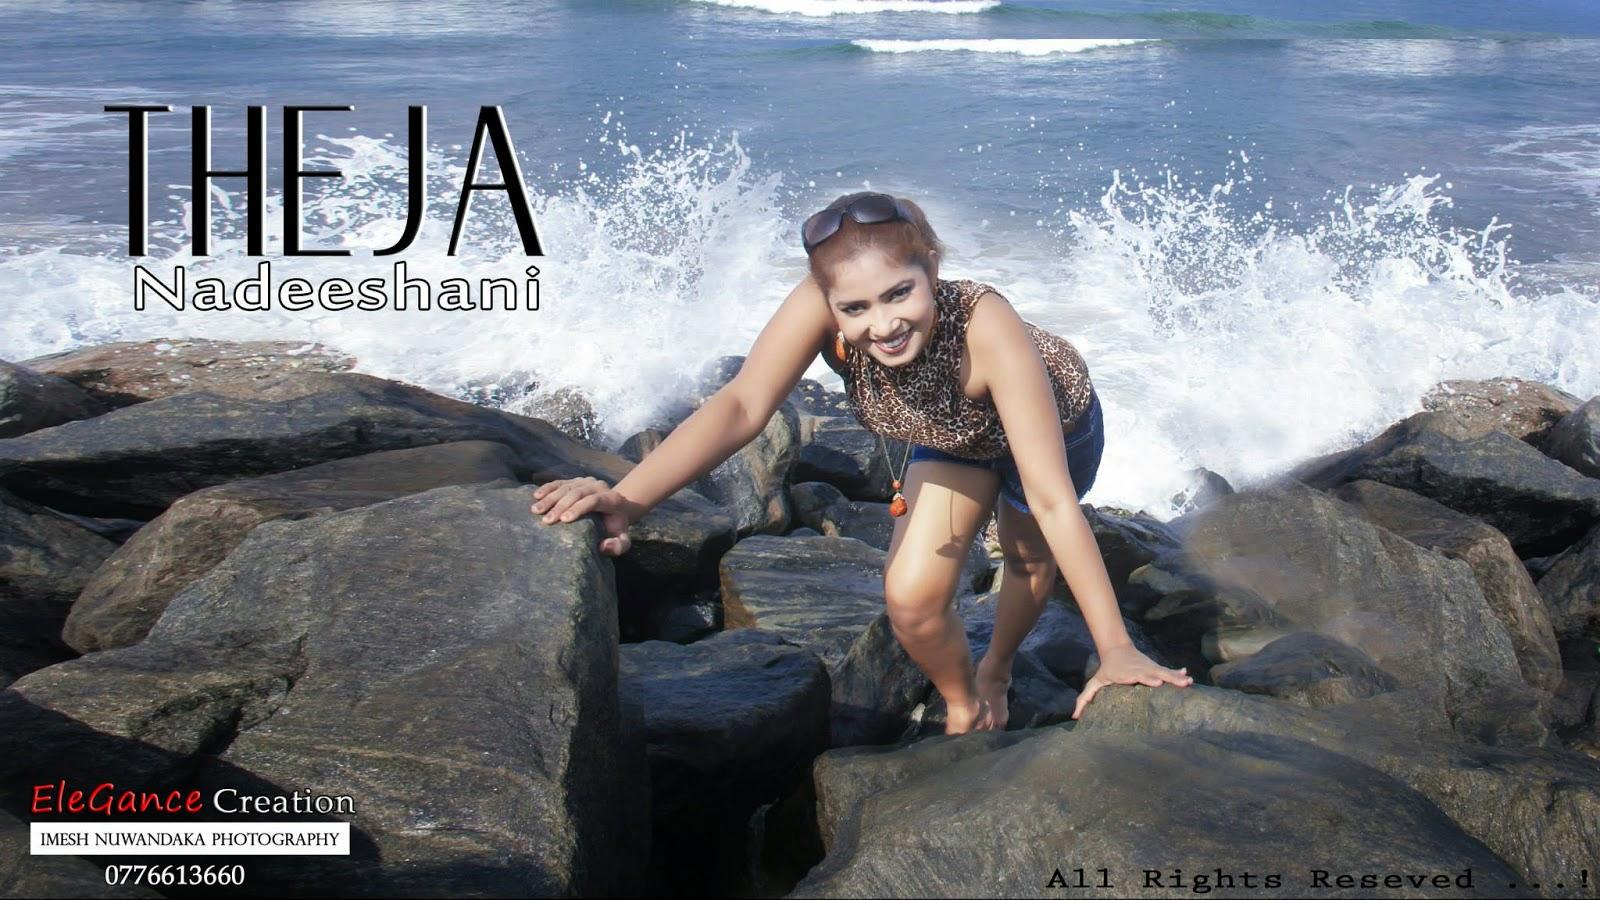 THEJA NADEESHANI beach